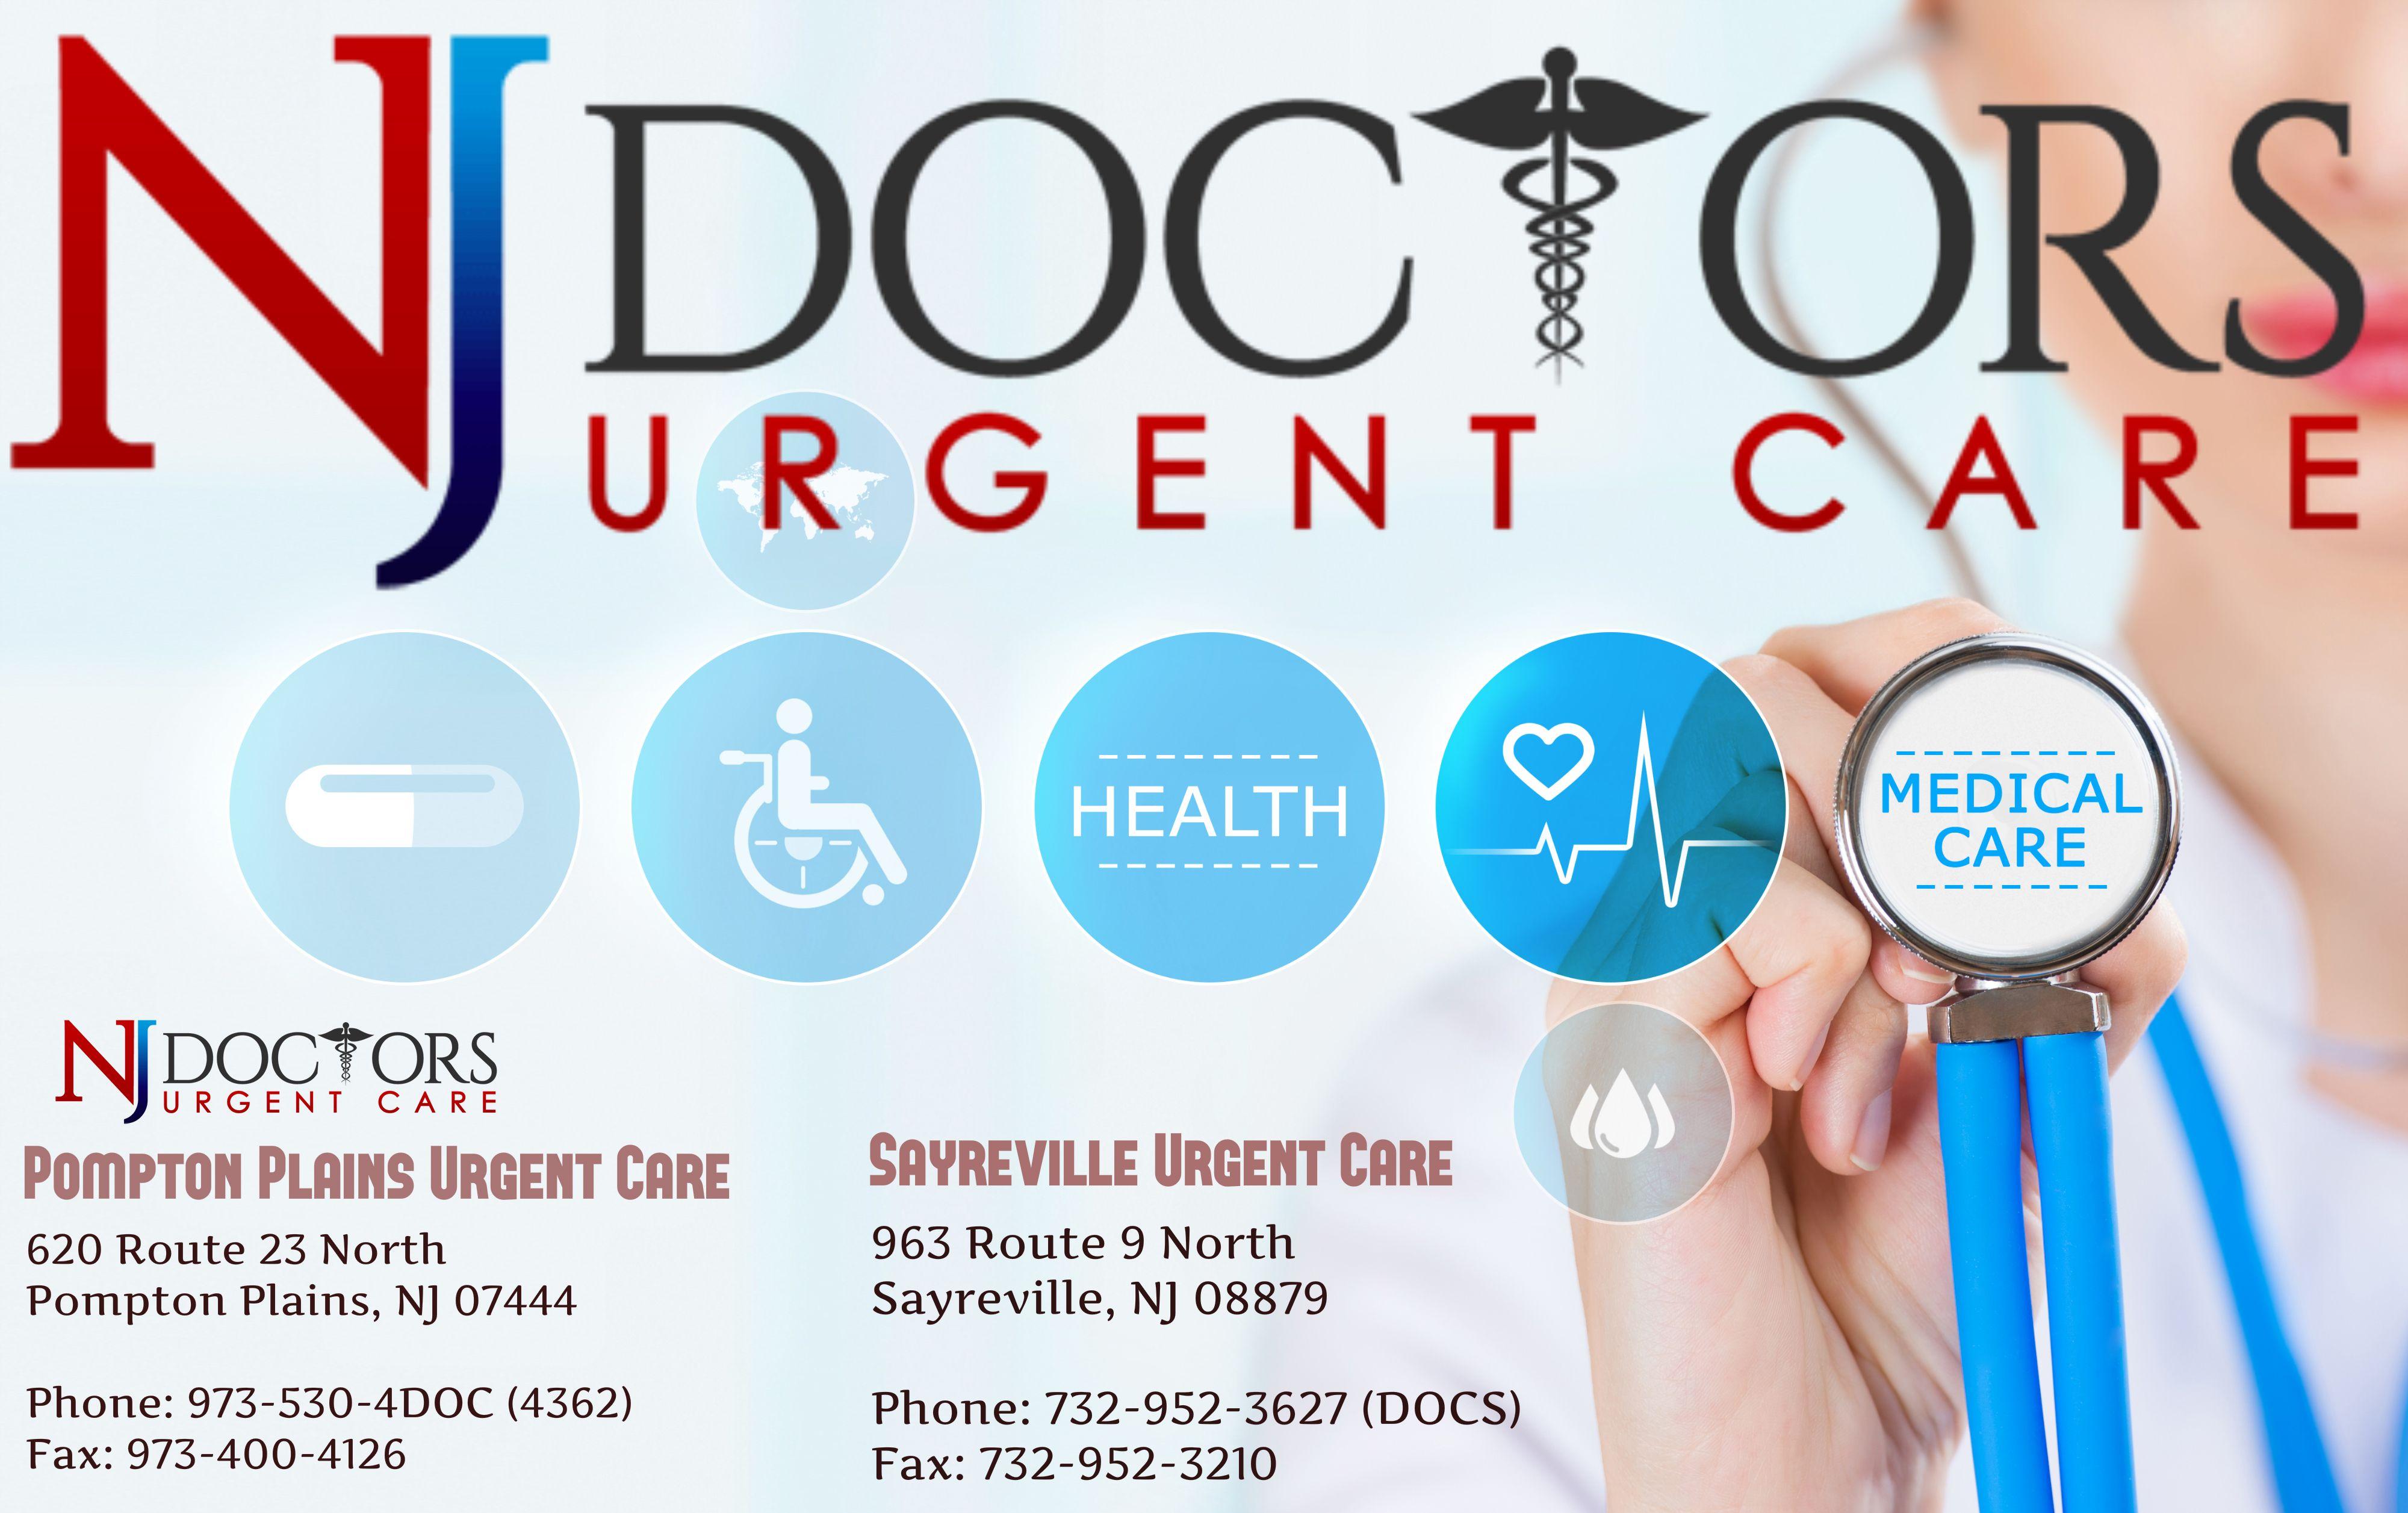 What Is Urgent Care Nj Doctors Urgent Care Urgent Care Drug Cards Doctor